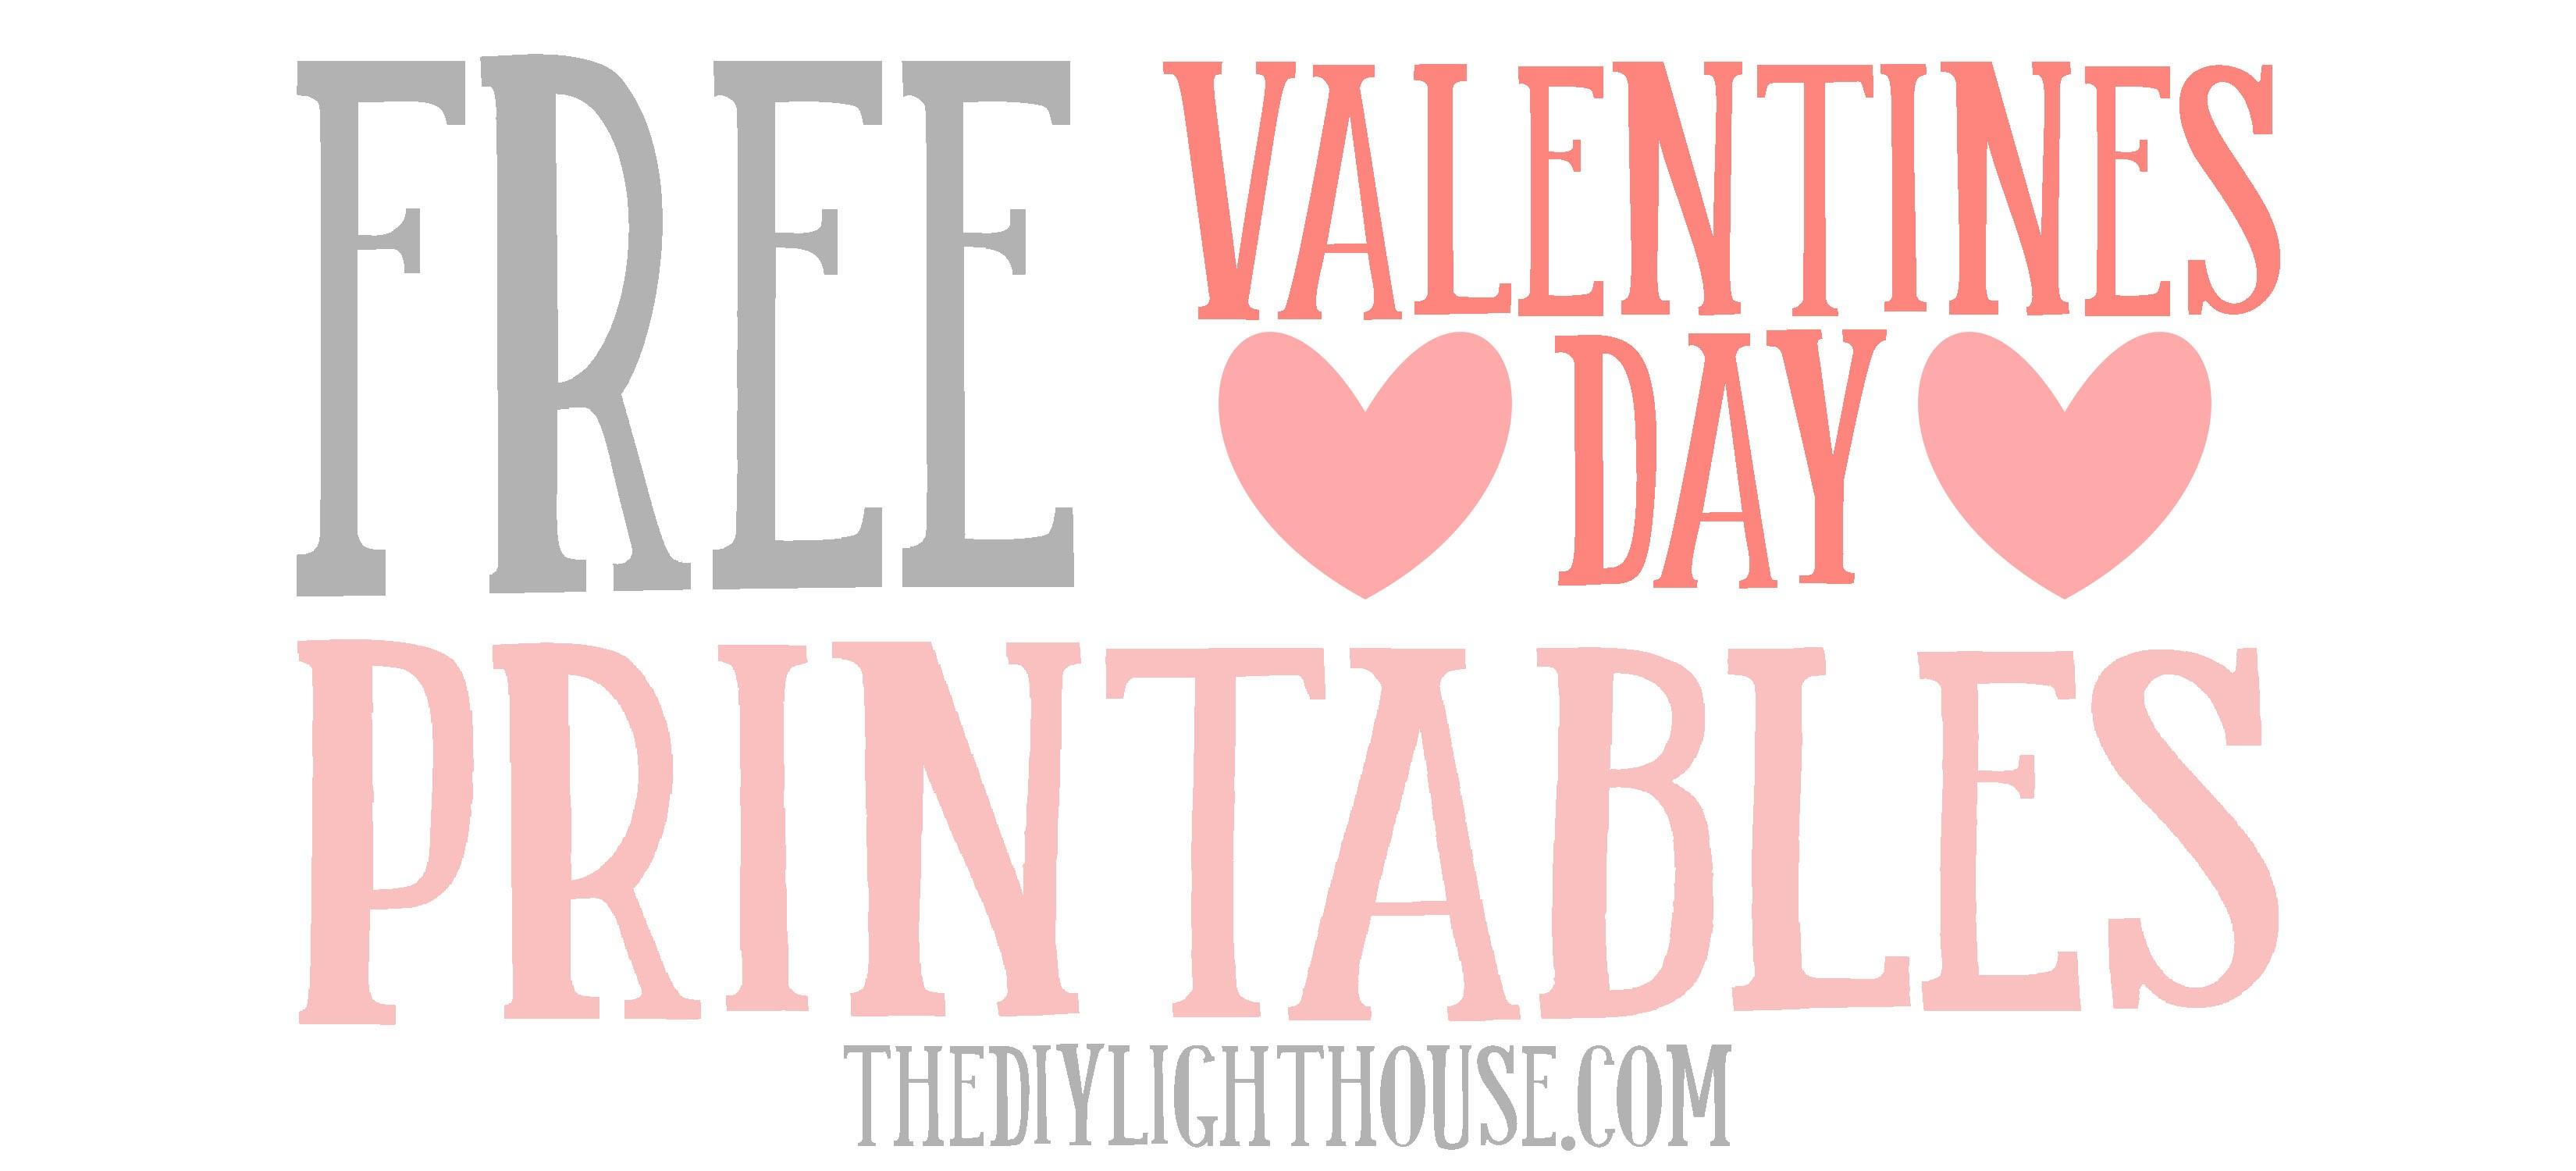 Fullsize Of Free Valentine Printables